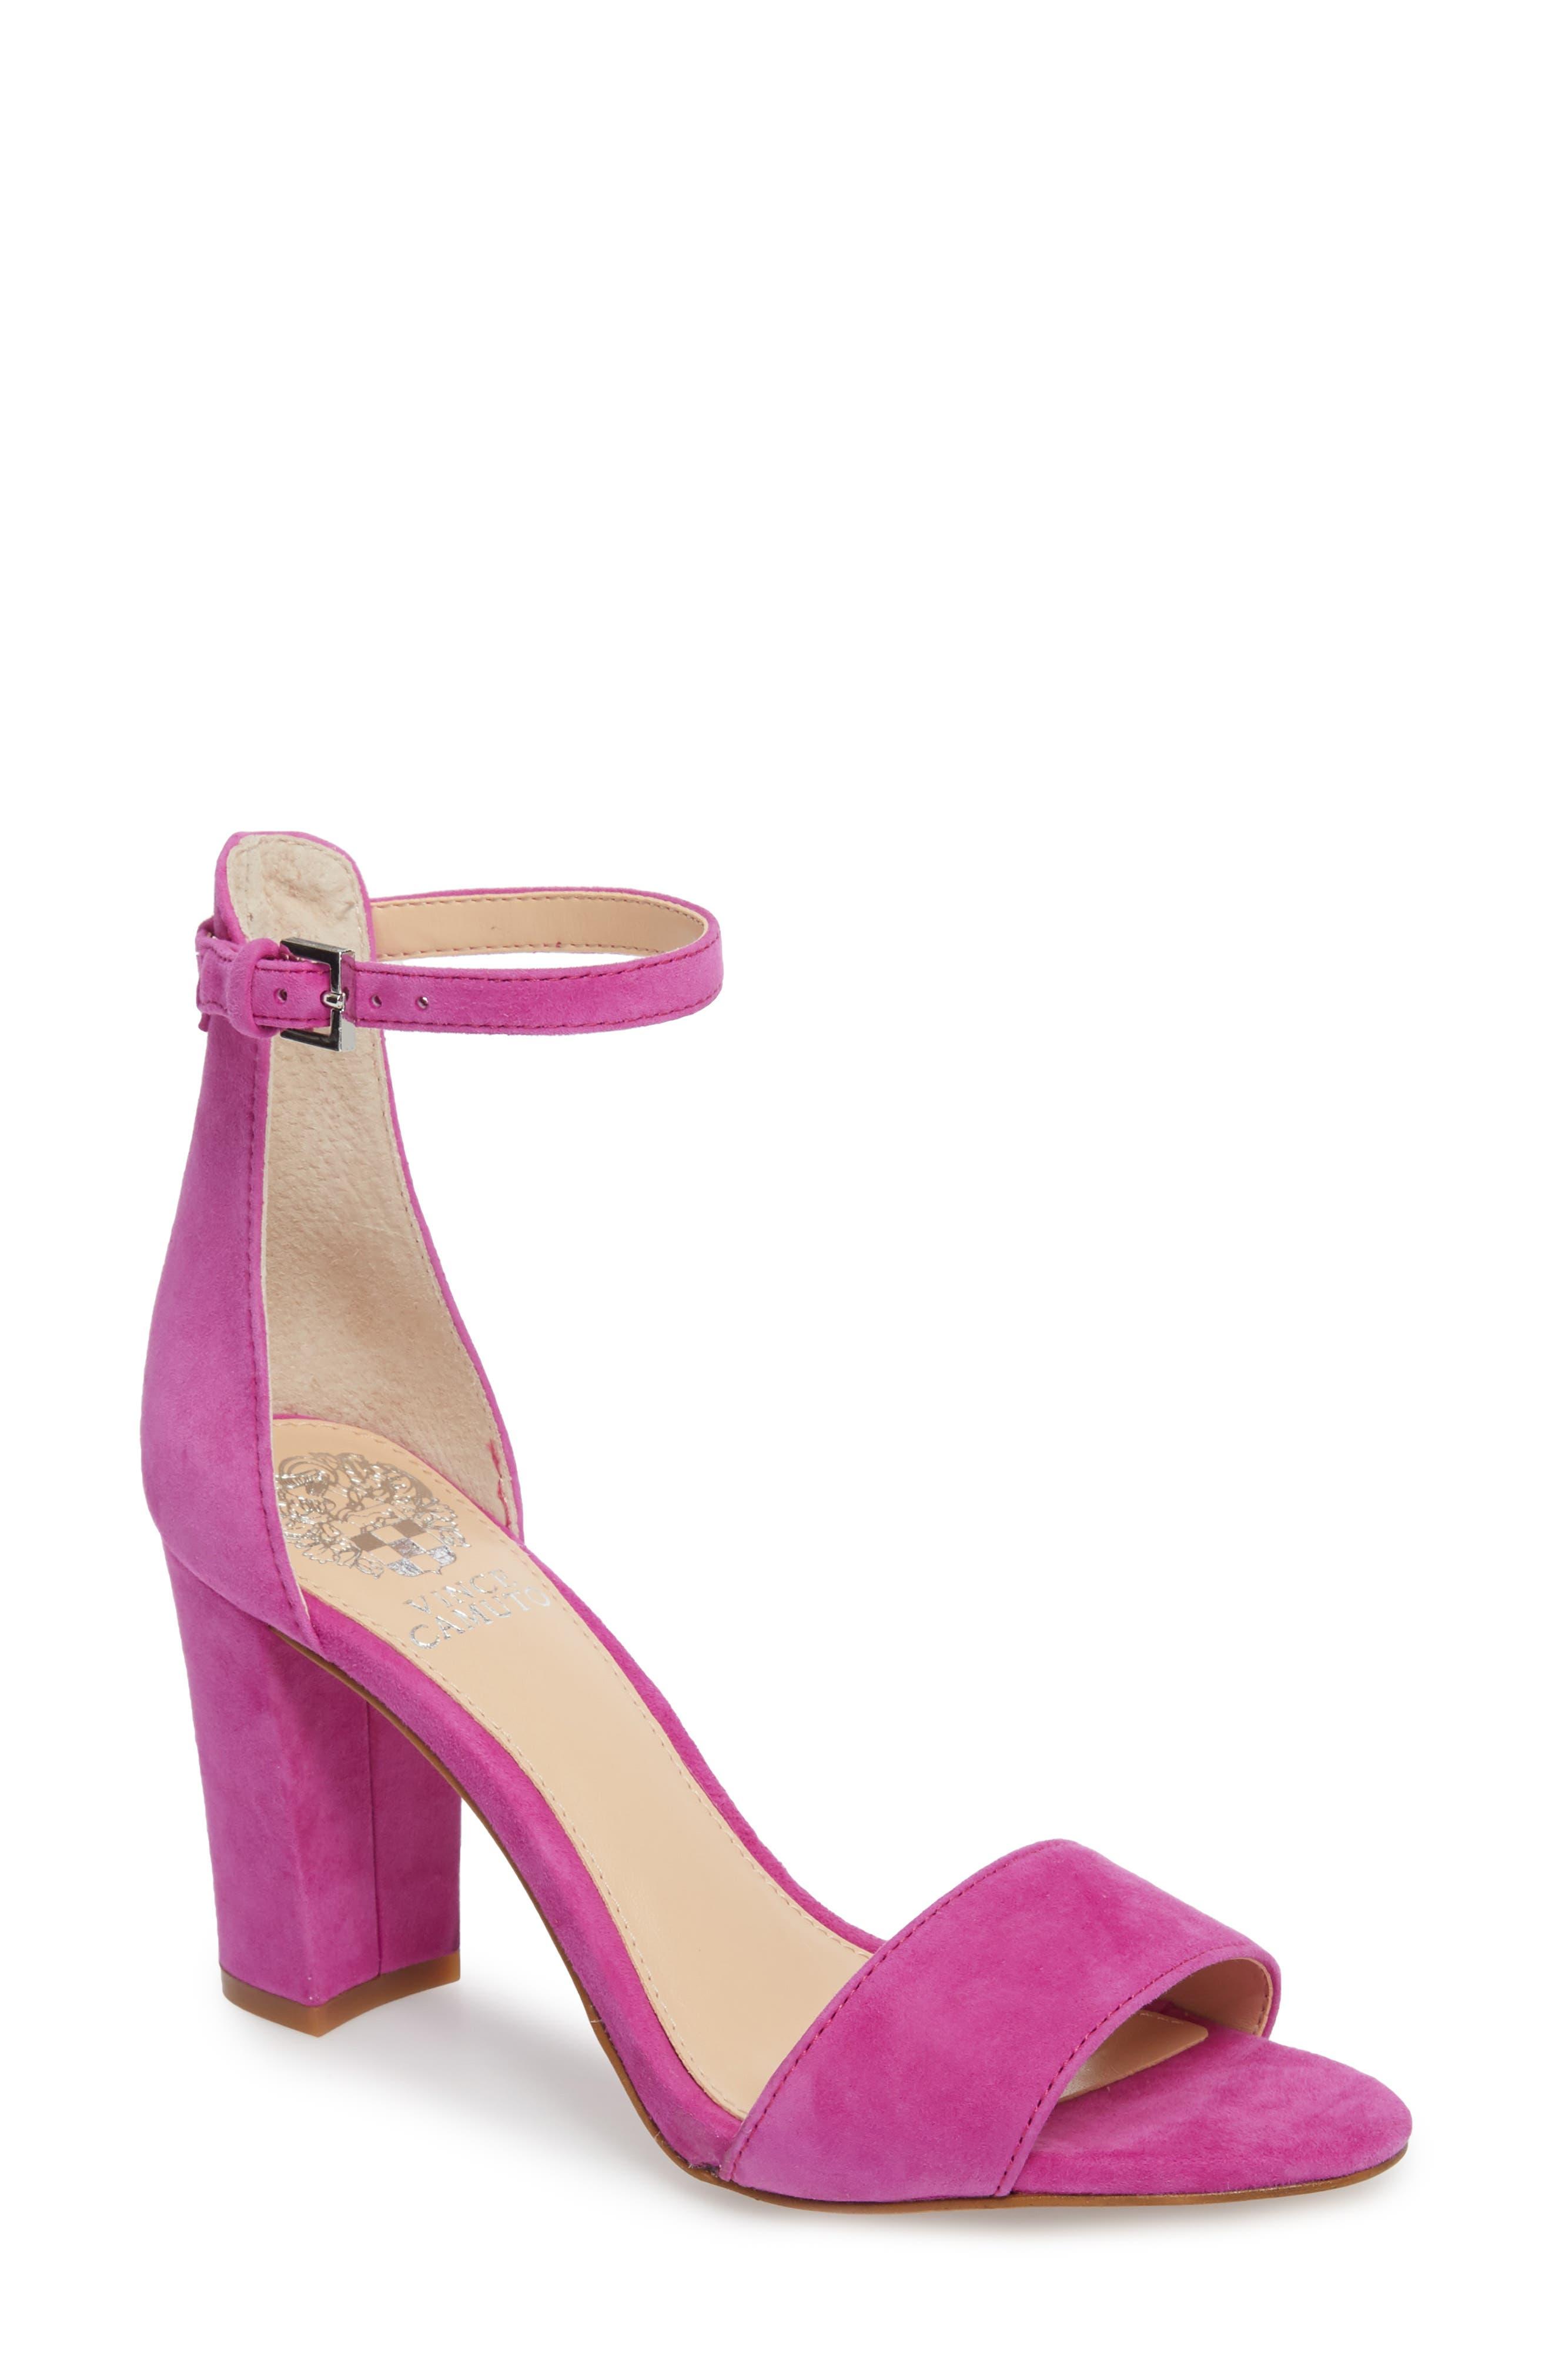 Corlina Ankle Strap Sandal,                         Main,                         color, Drama Pink Suede